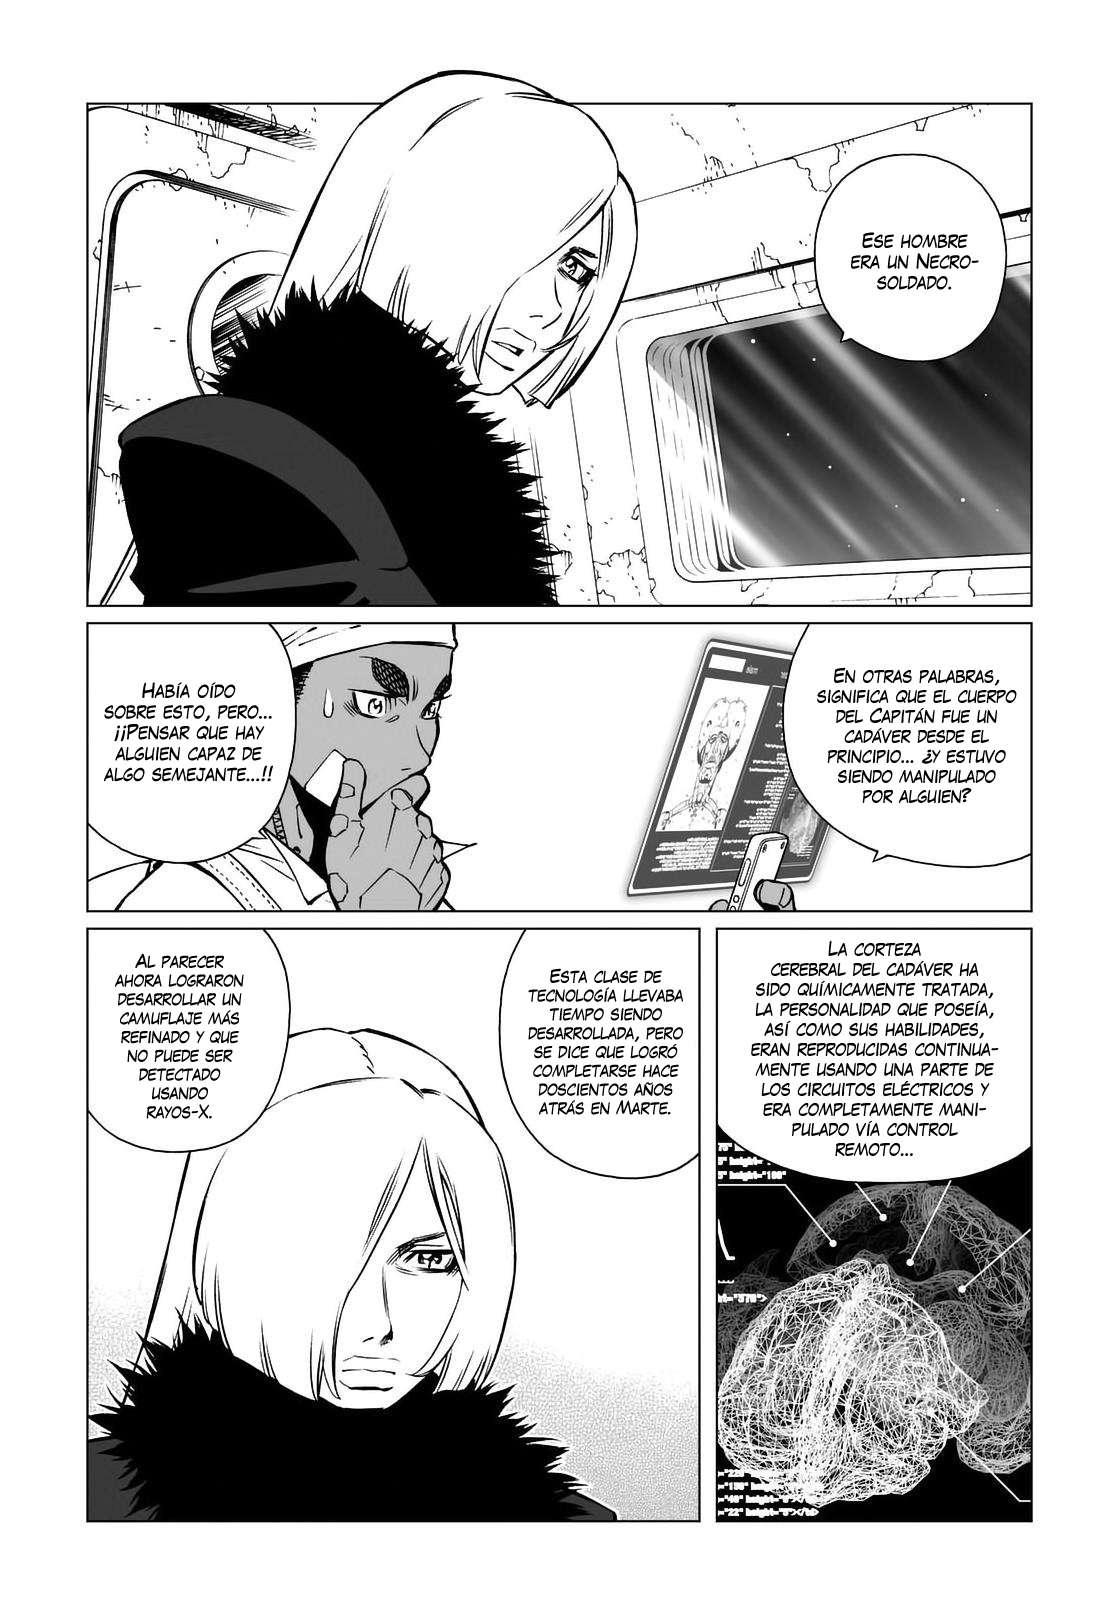 https://c5.ninemanga.com/es_manga/41/18217/423018/b1ae841025025b7b9bd01561f6f477ca.jpg Page 10